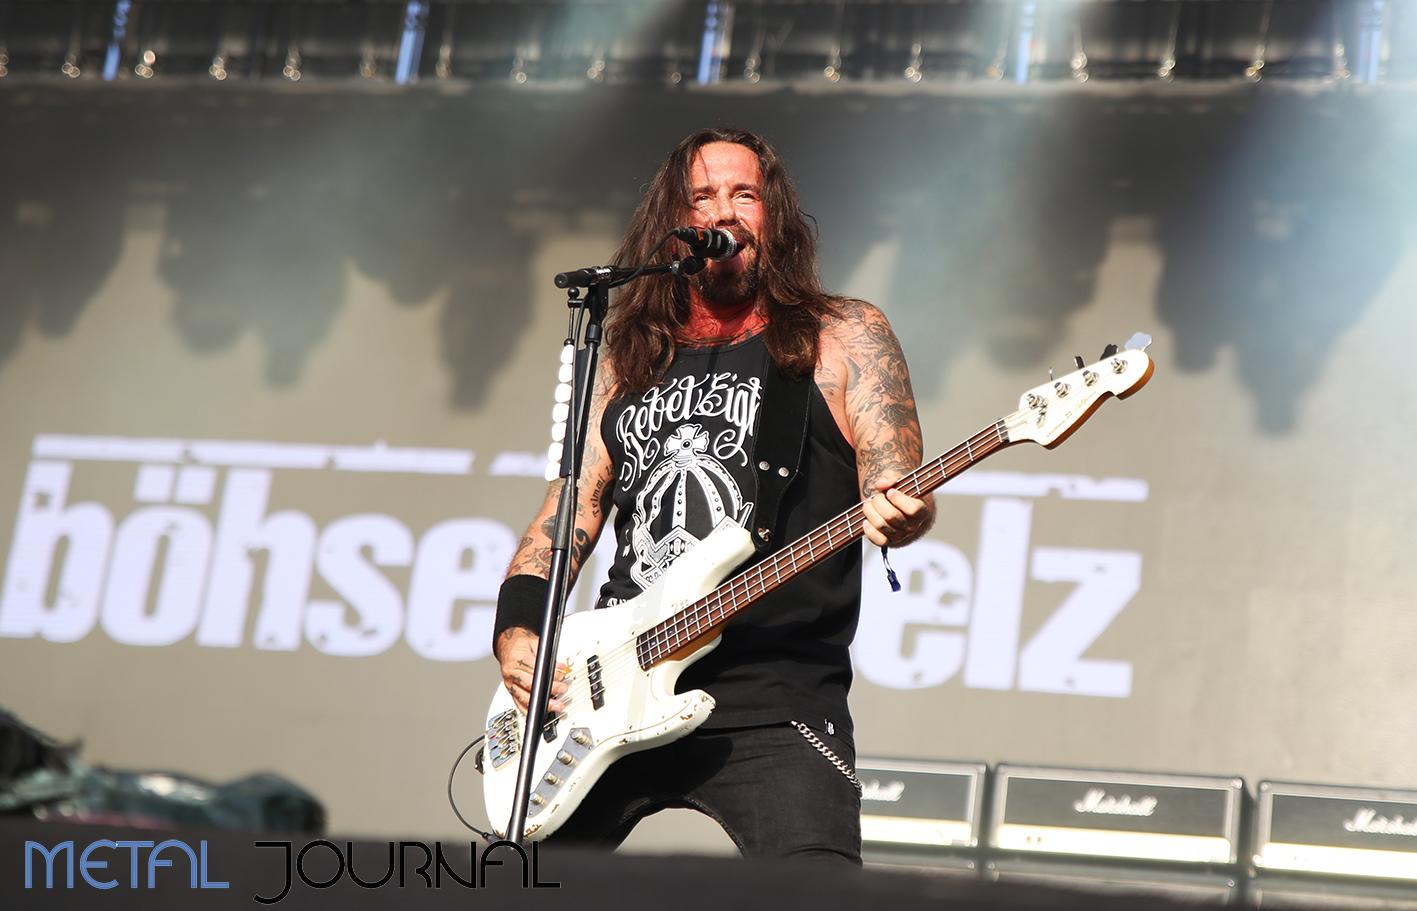 bohse onkelz - metal journal rock fest barcelona 2019 pic 4